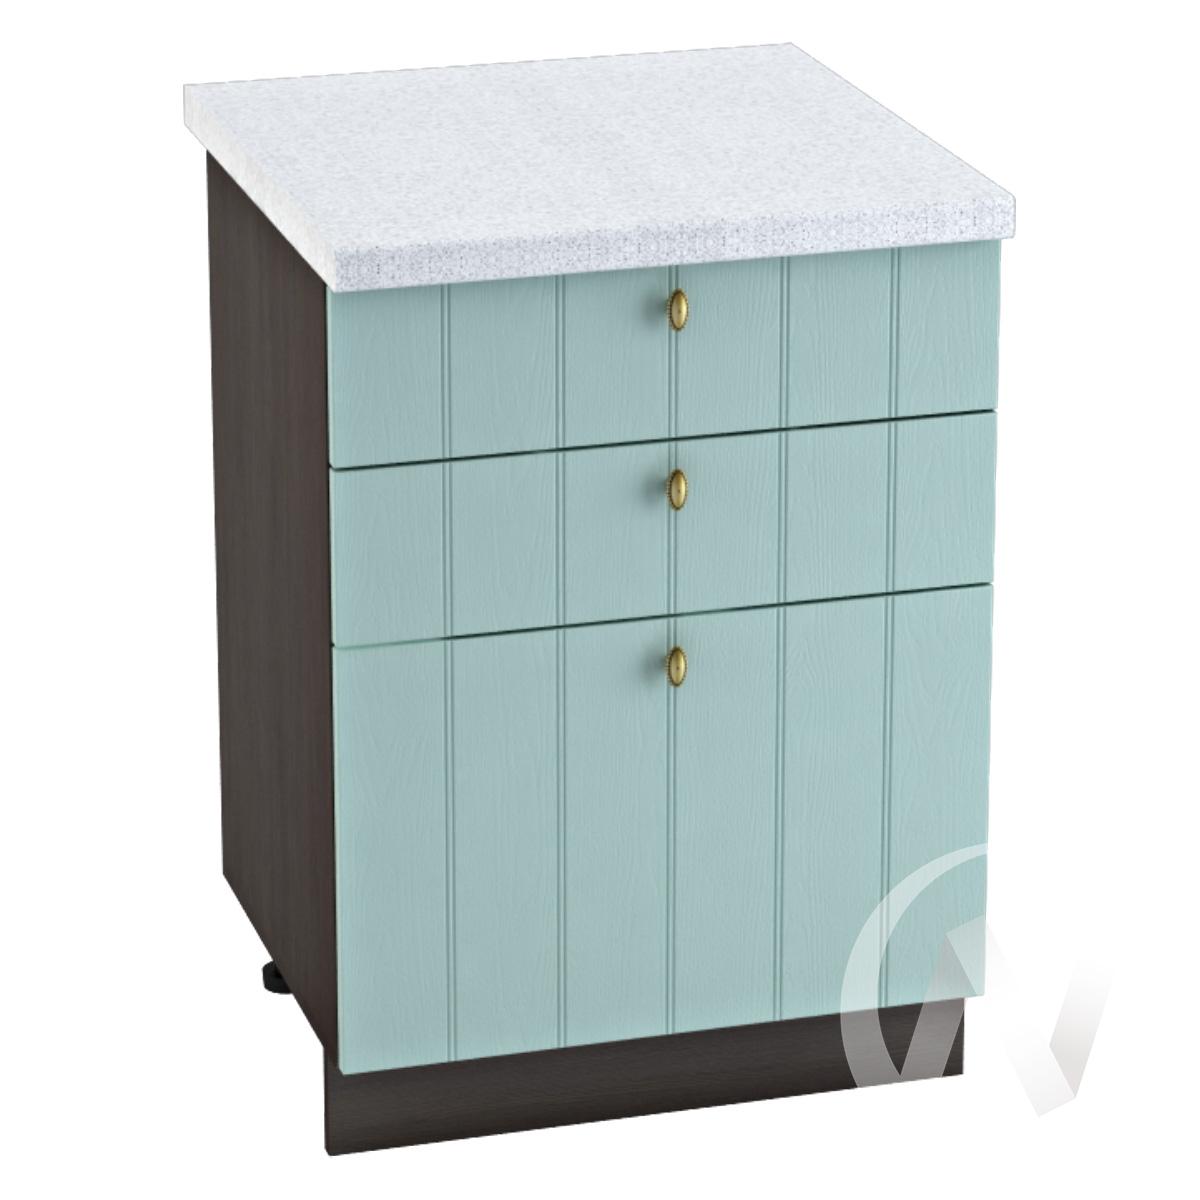 "Кухня ""Прованс"": Шкаф нижний с 3-мя ящиками 600, ШН3Я 600 (голубой/корпус венге)"